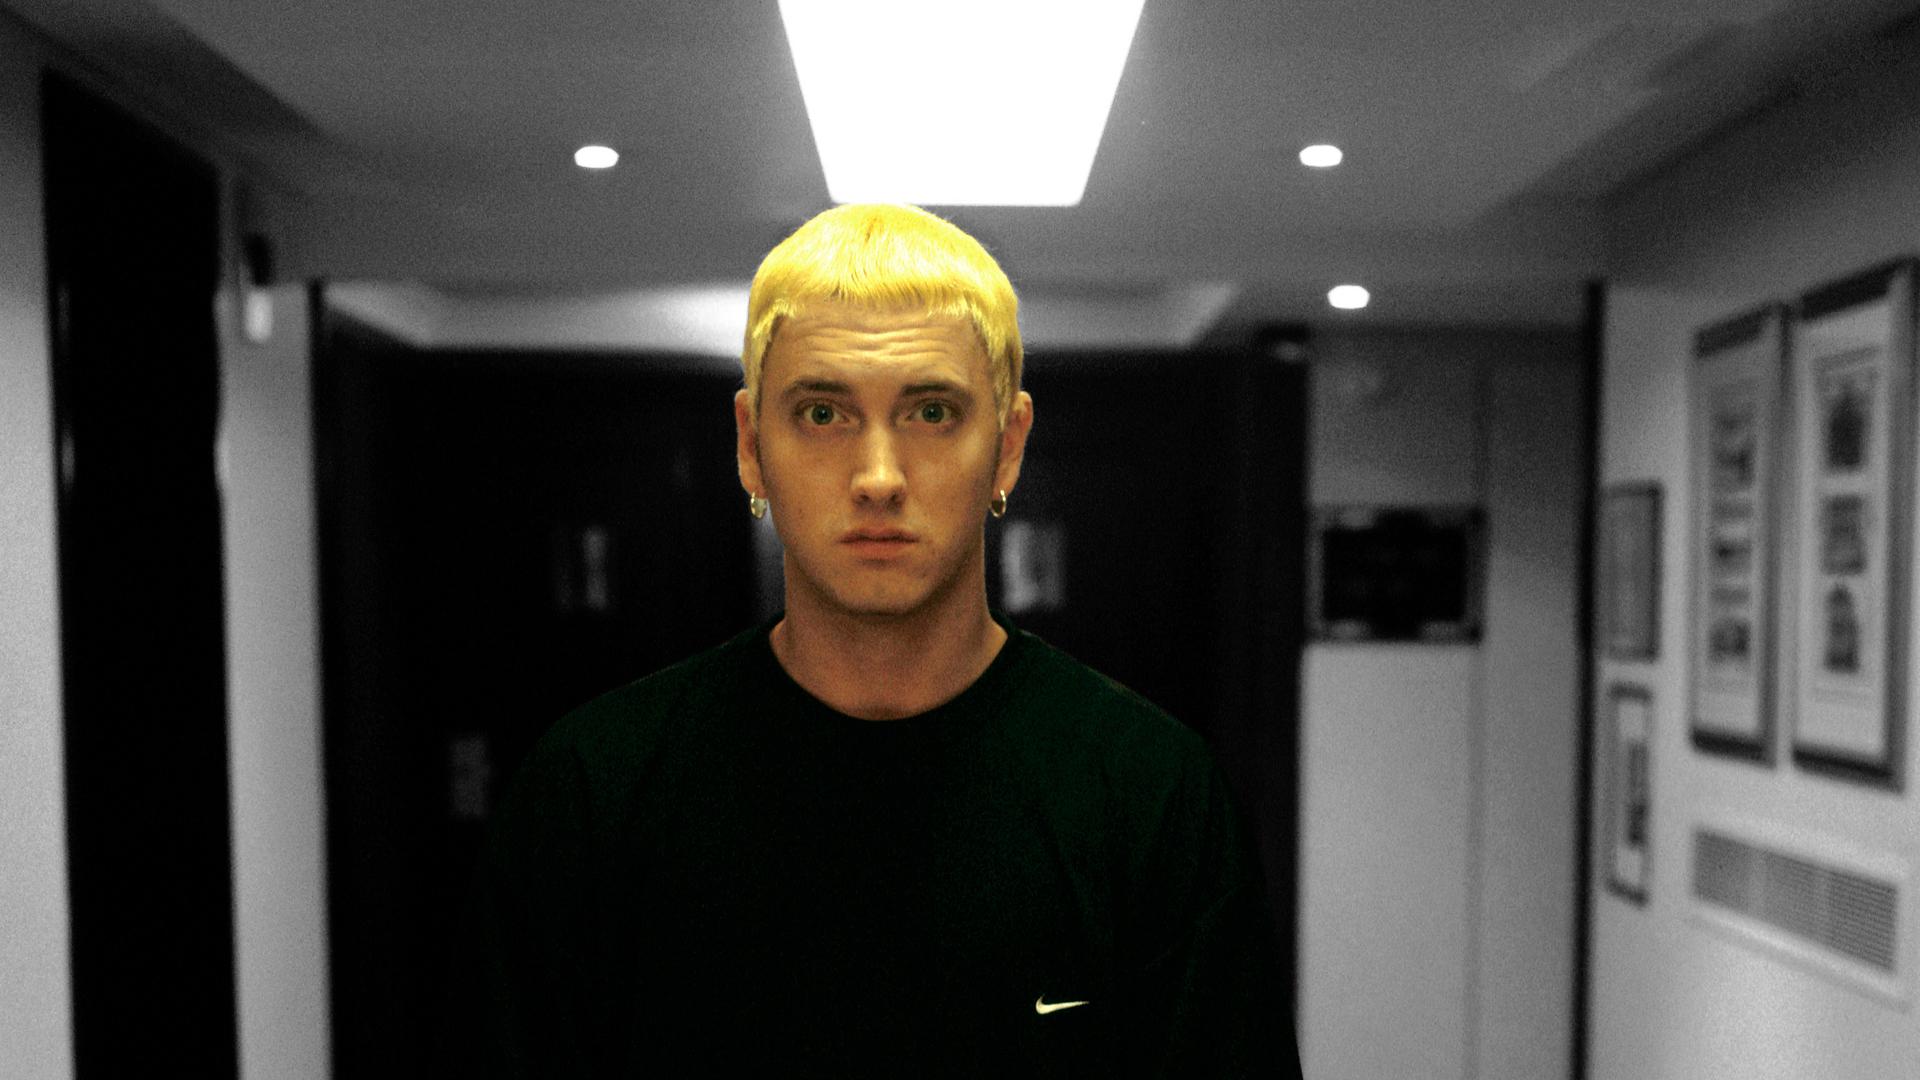 Fall Out Boy Desktop Wallpaper Hd Eminem Wallpapers Backgrounds Free Download Pixelstalk Net